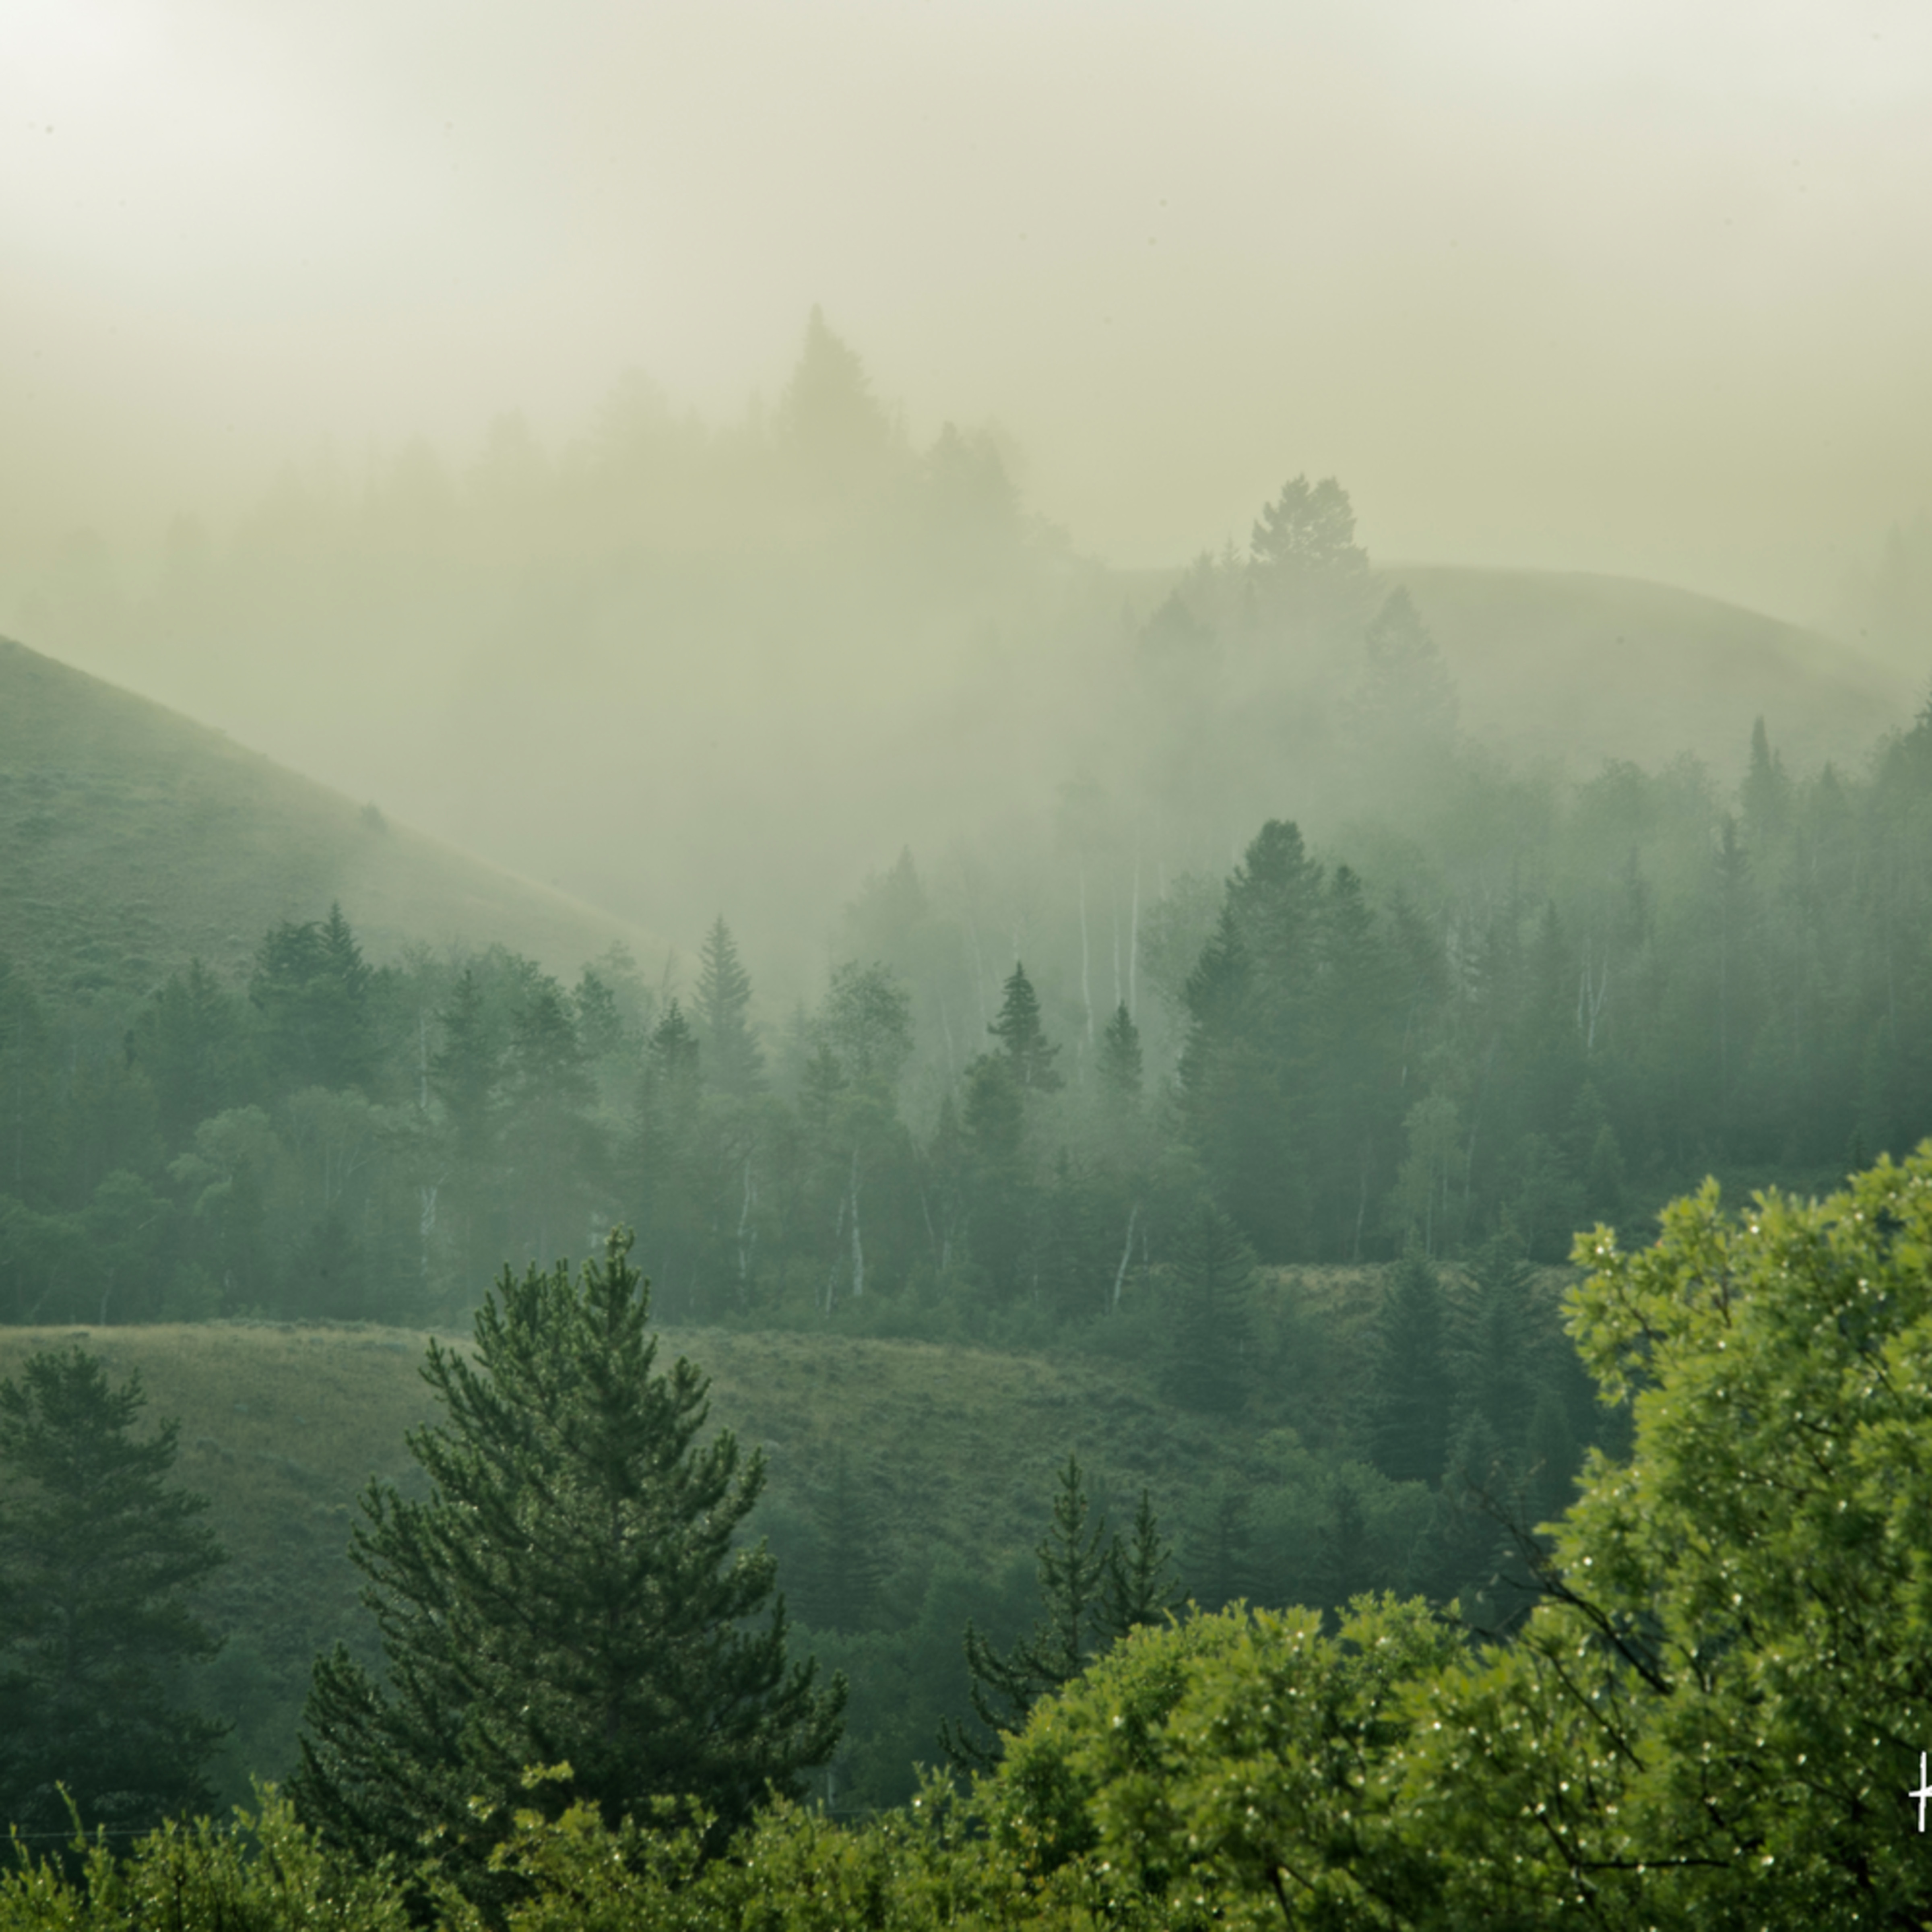 Layered fog gtqmhf